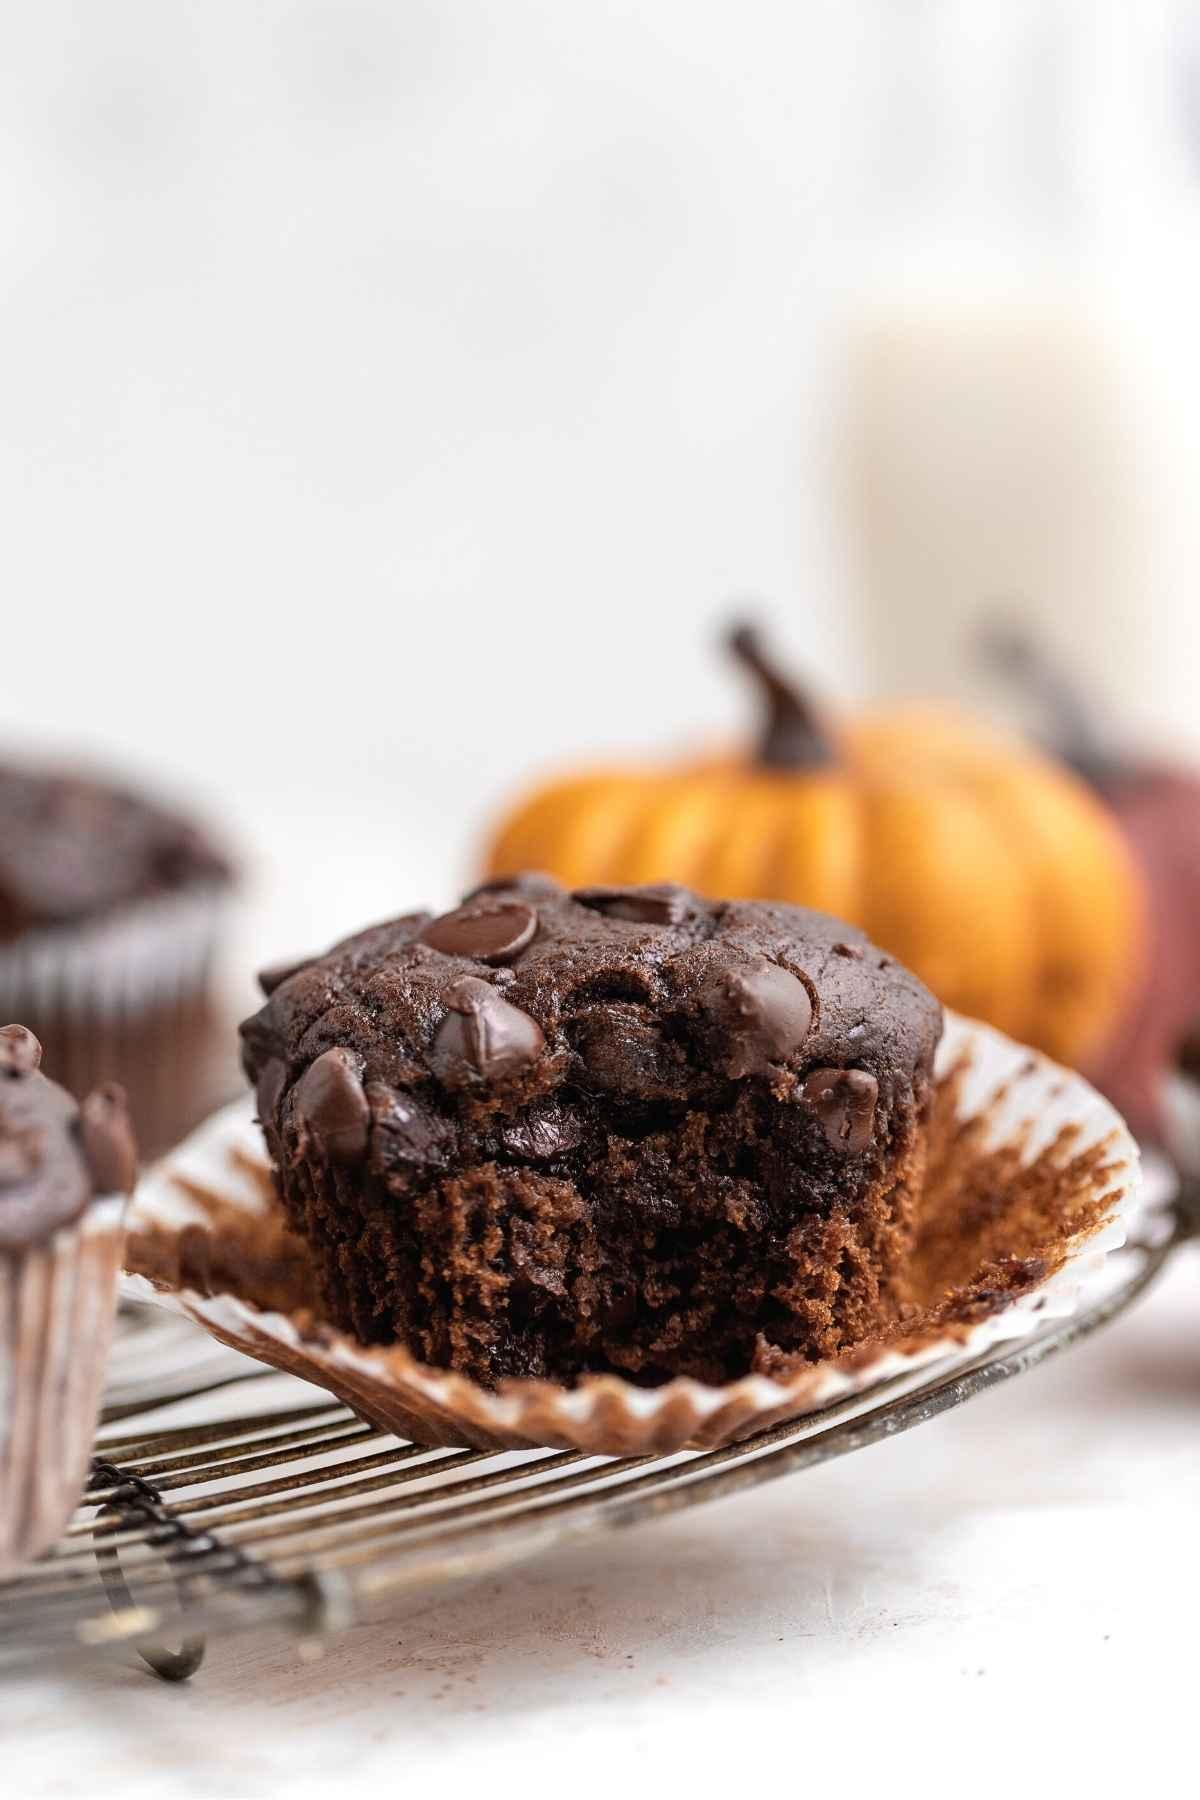 Chocolate Pumpkin Muffins on wire rack with bite taken